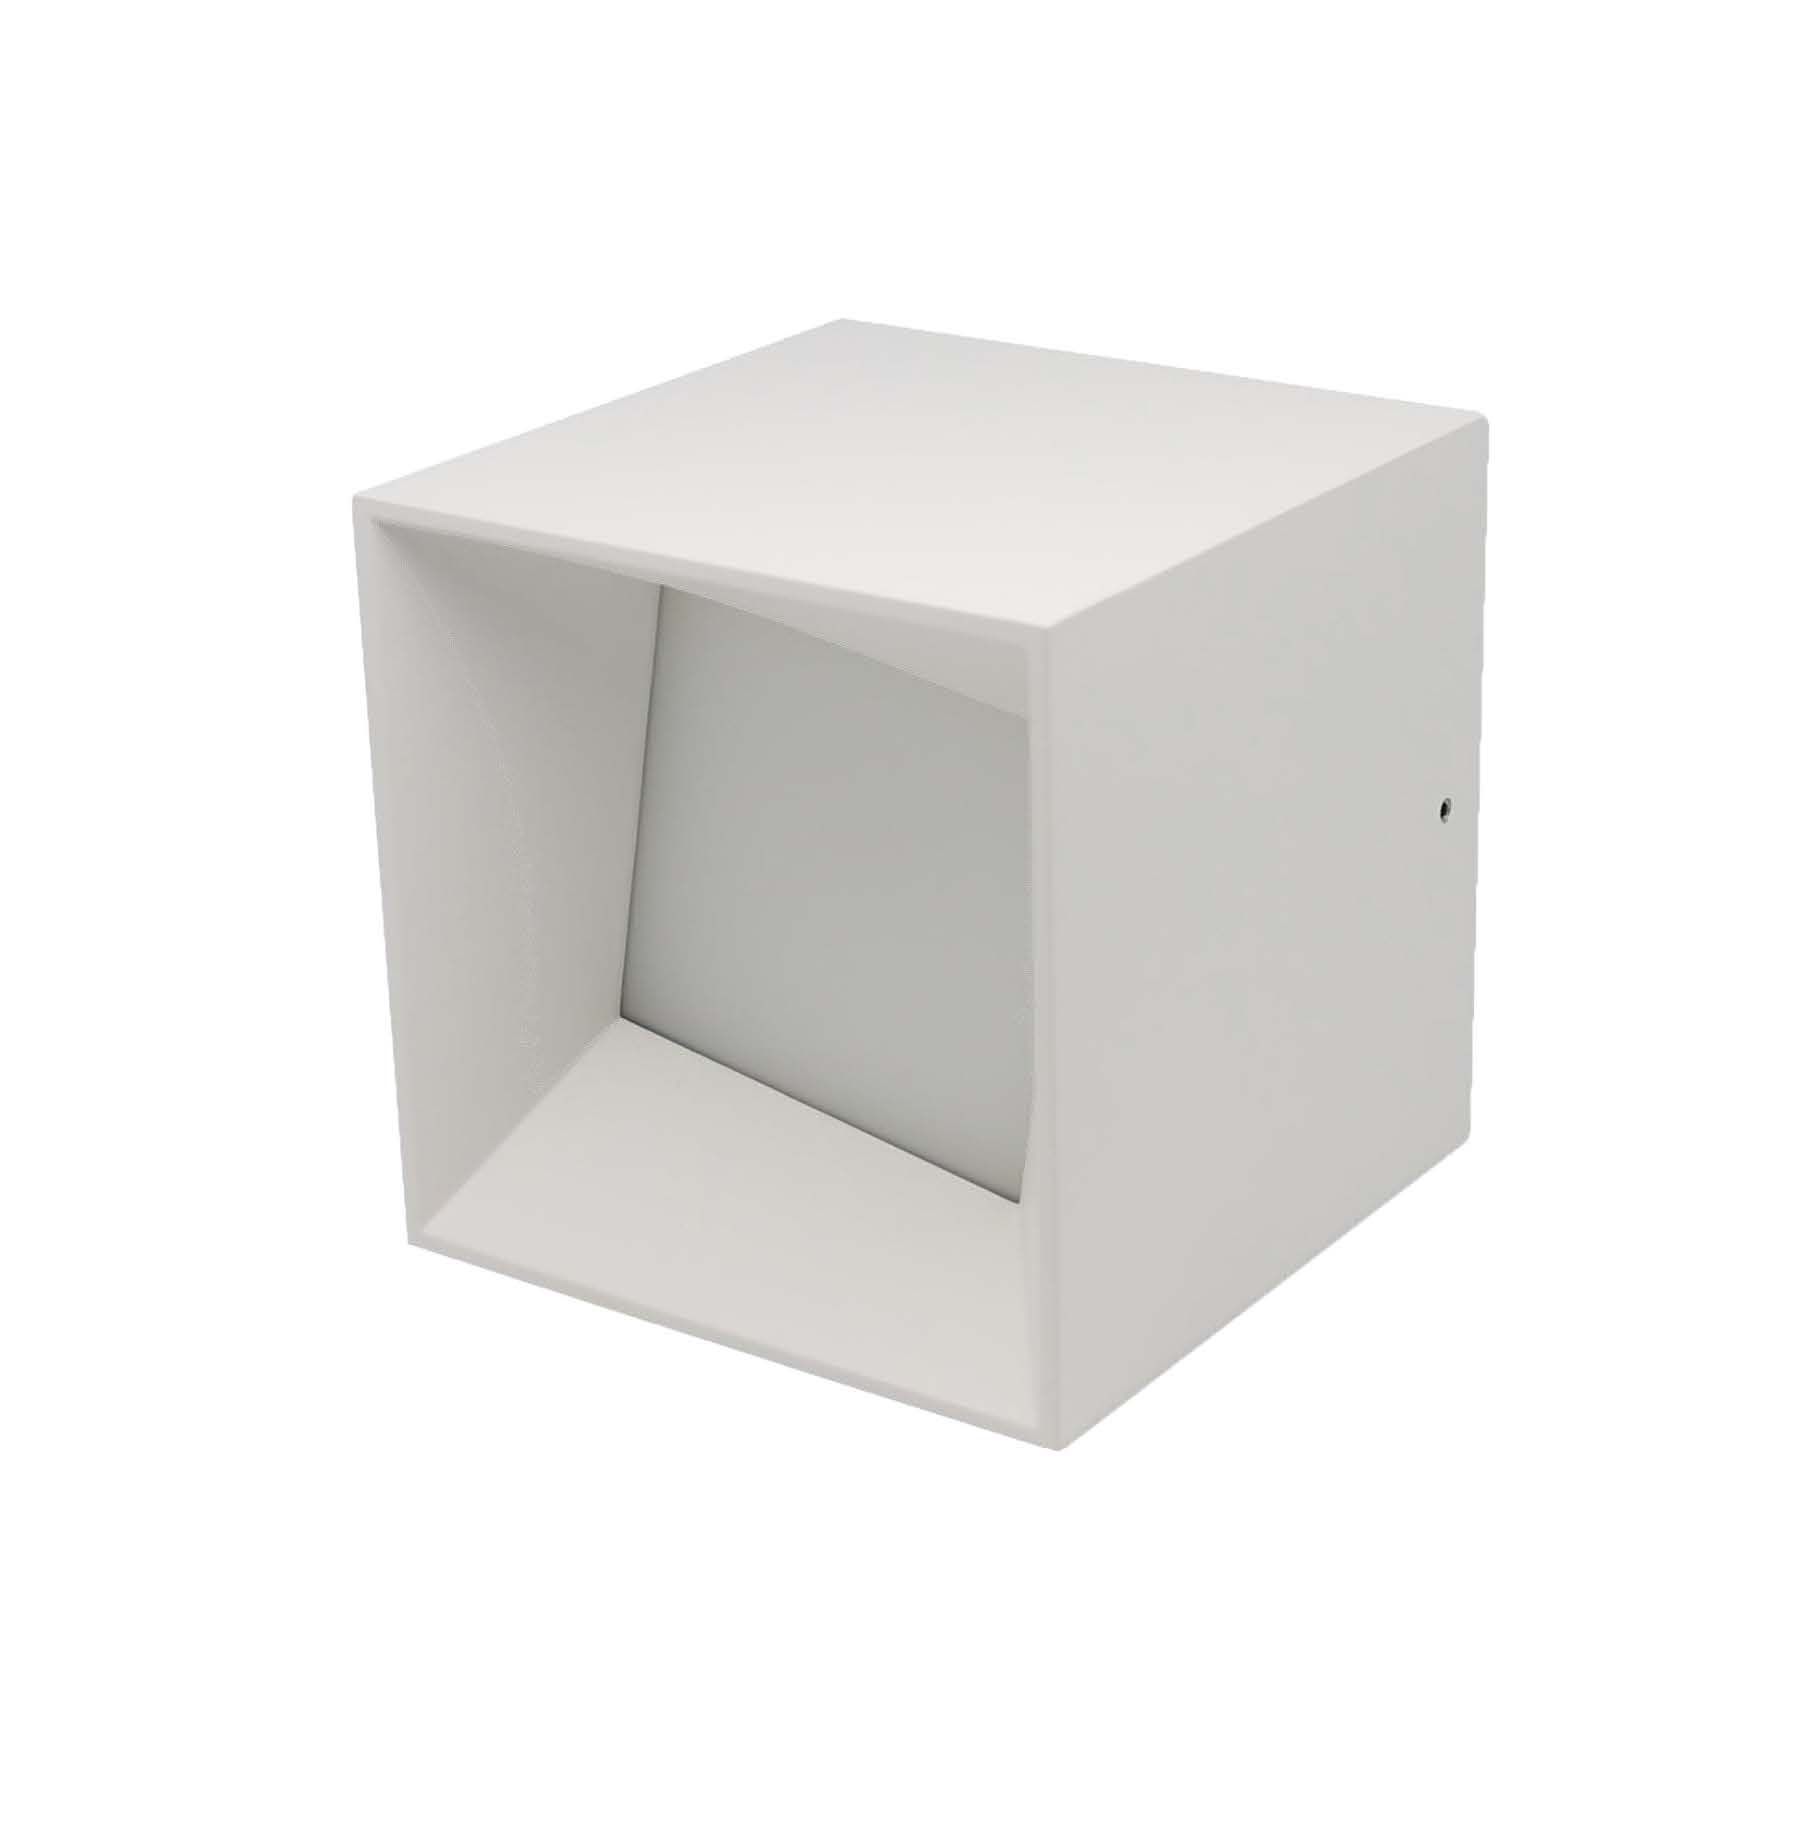 SOE surface mount square weatherproof downlight